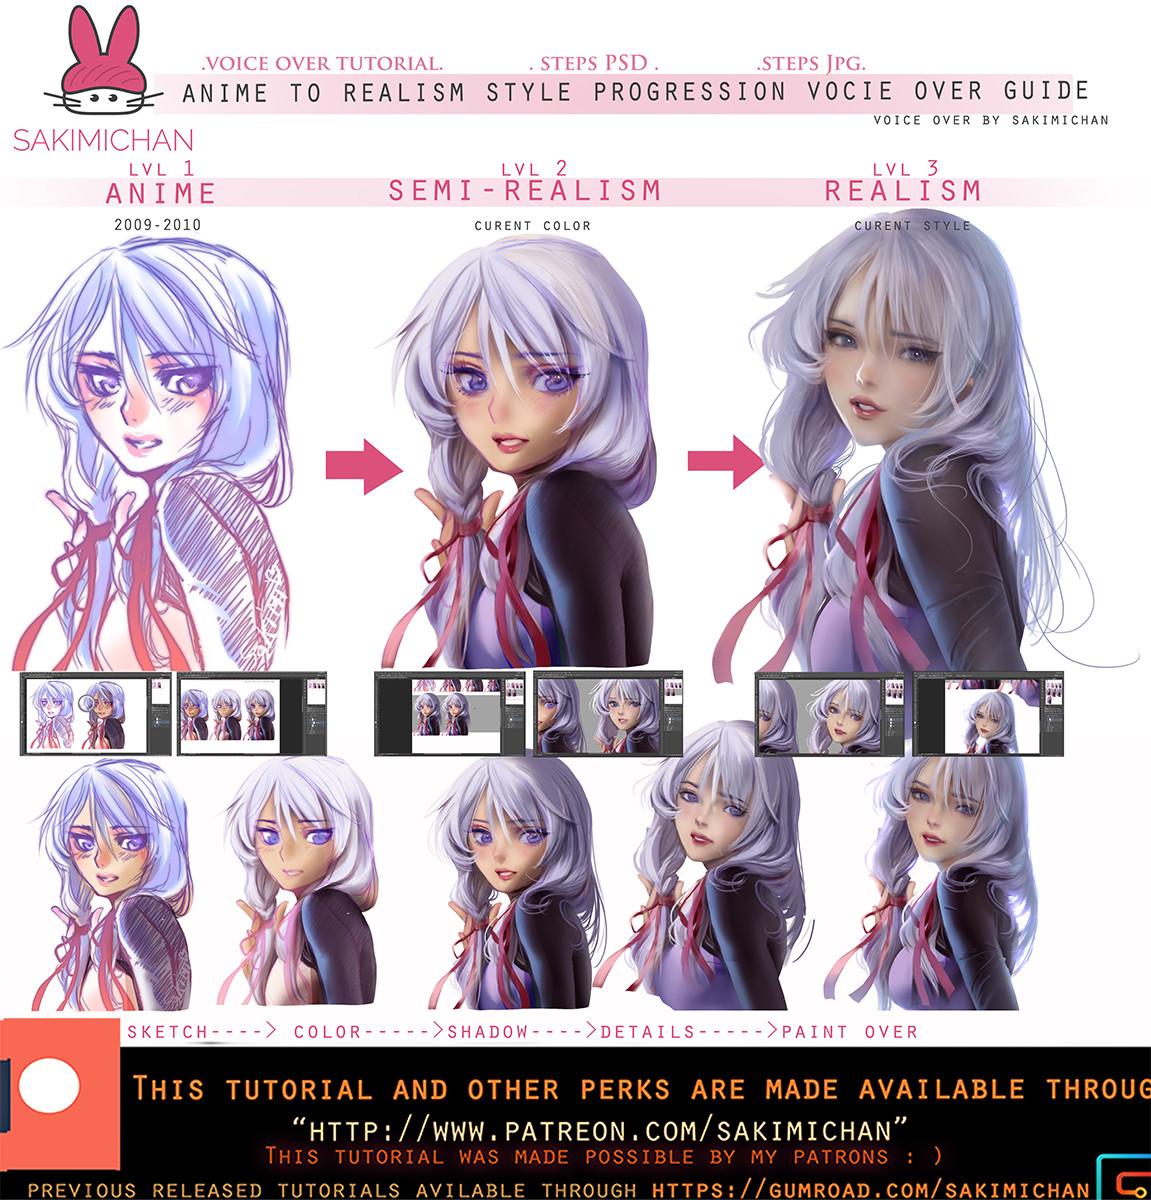 Sakimi chan style procression voice over tutorialpromo